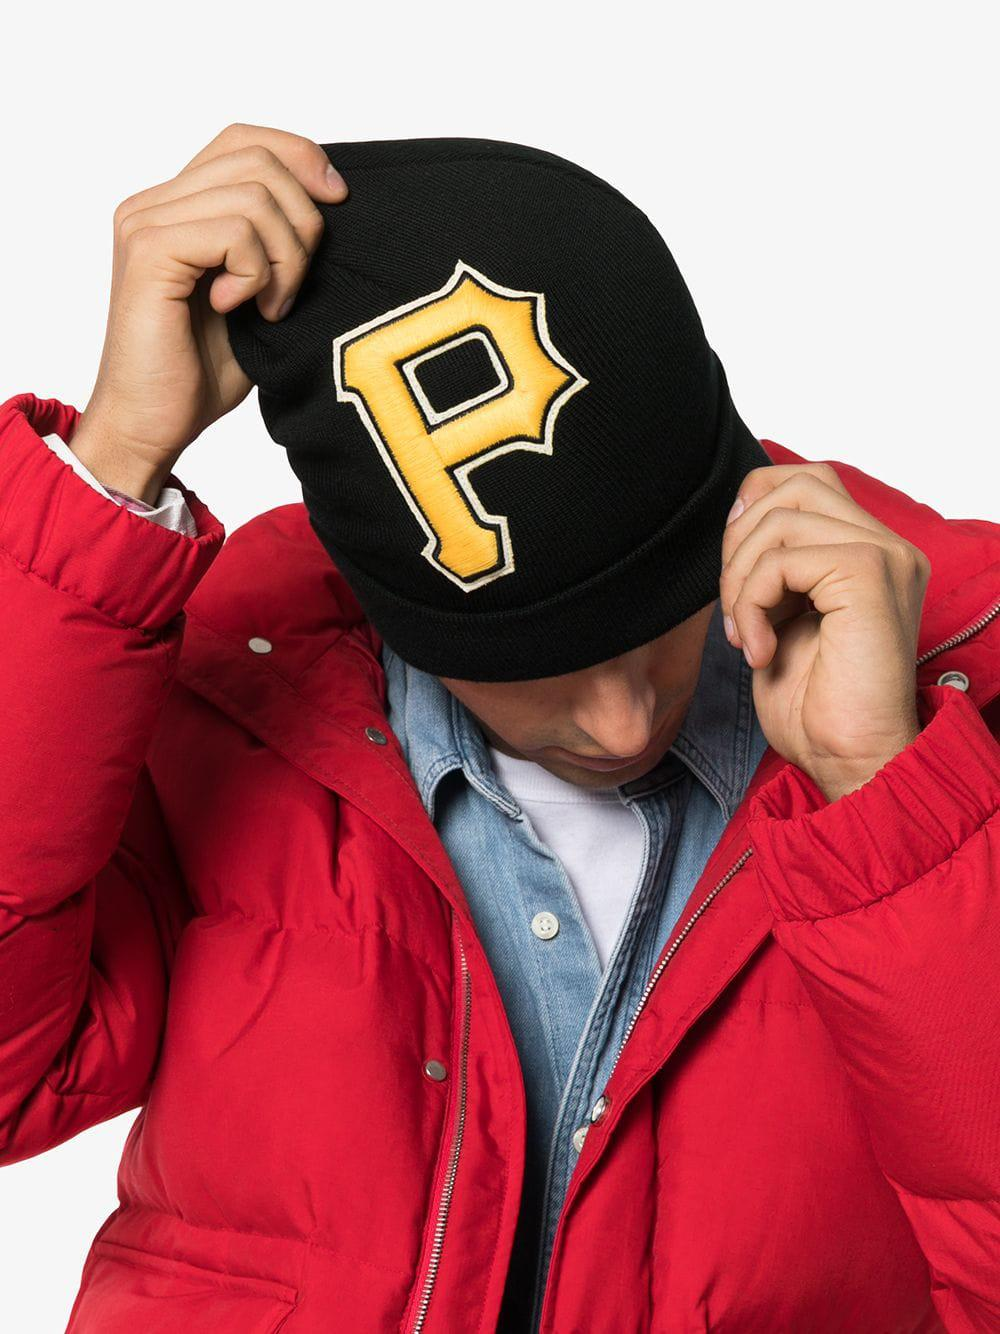 Gucci - Black Gorro Pittsburgh Pirates for Men - Lyst. Ver en pantalla  completa 5dc4ddf366f